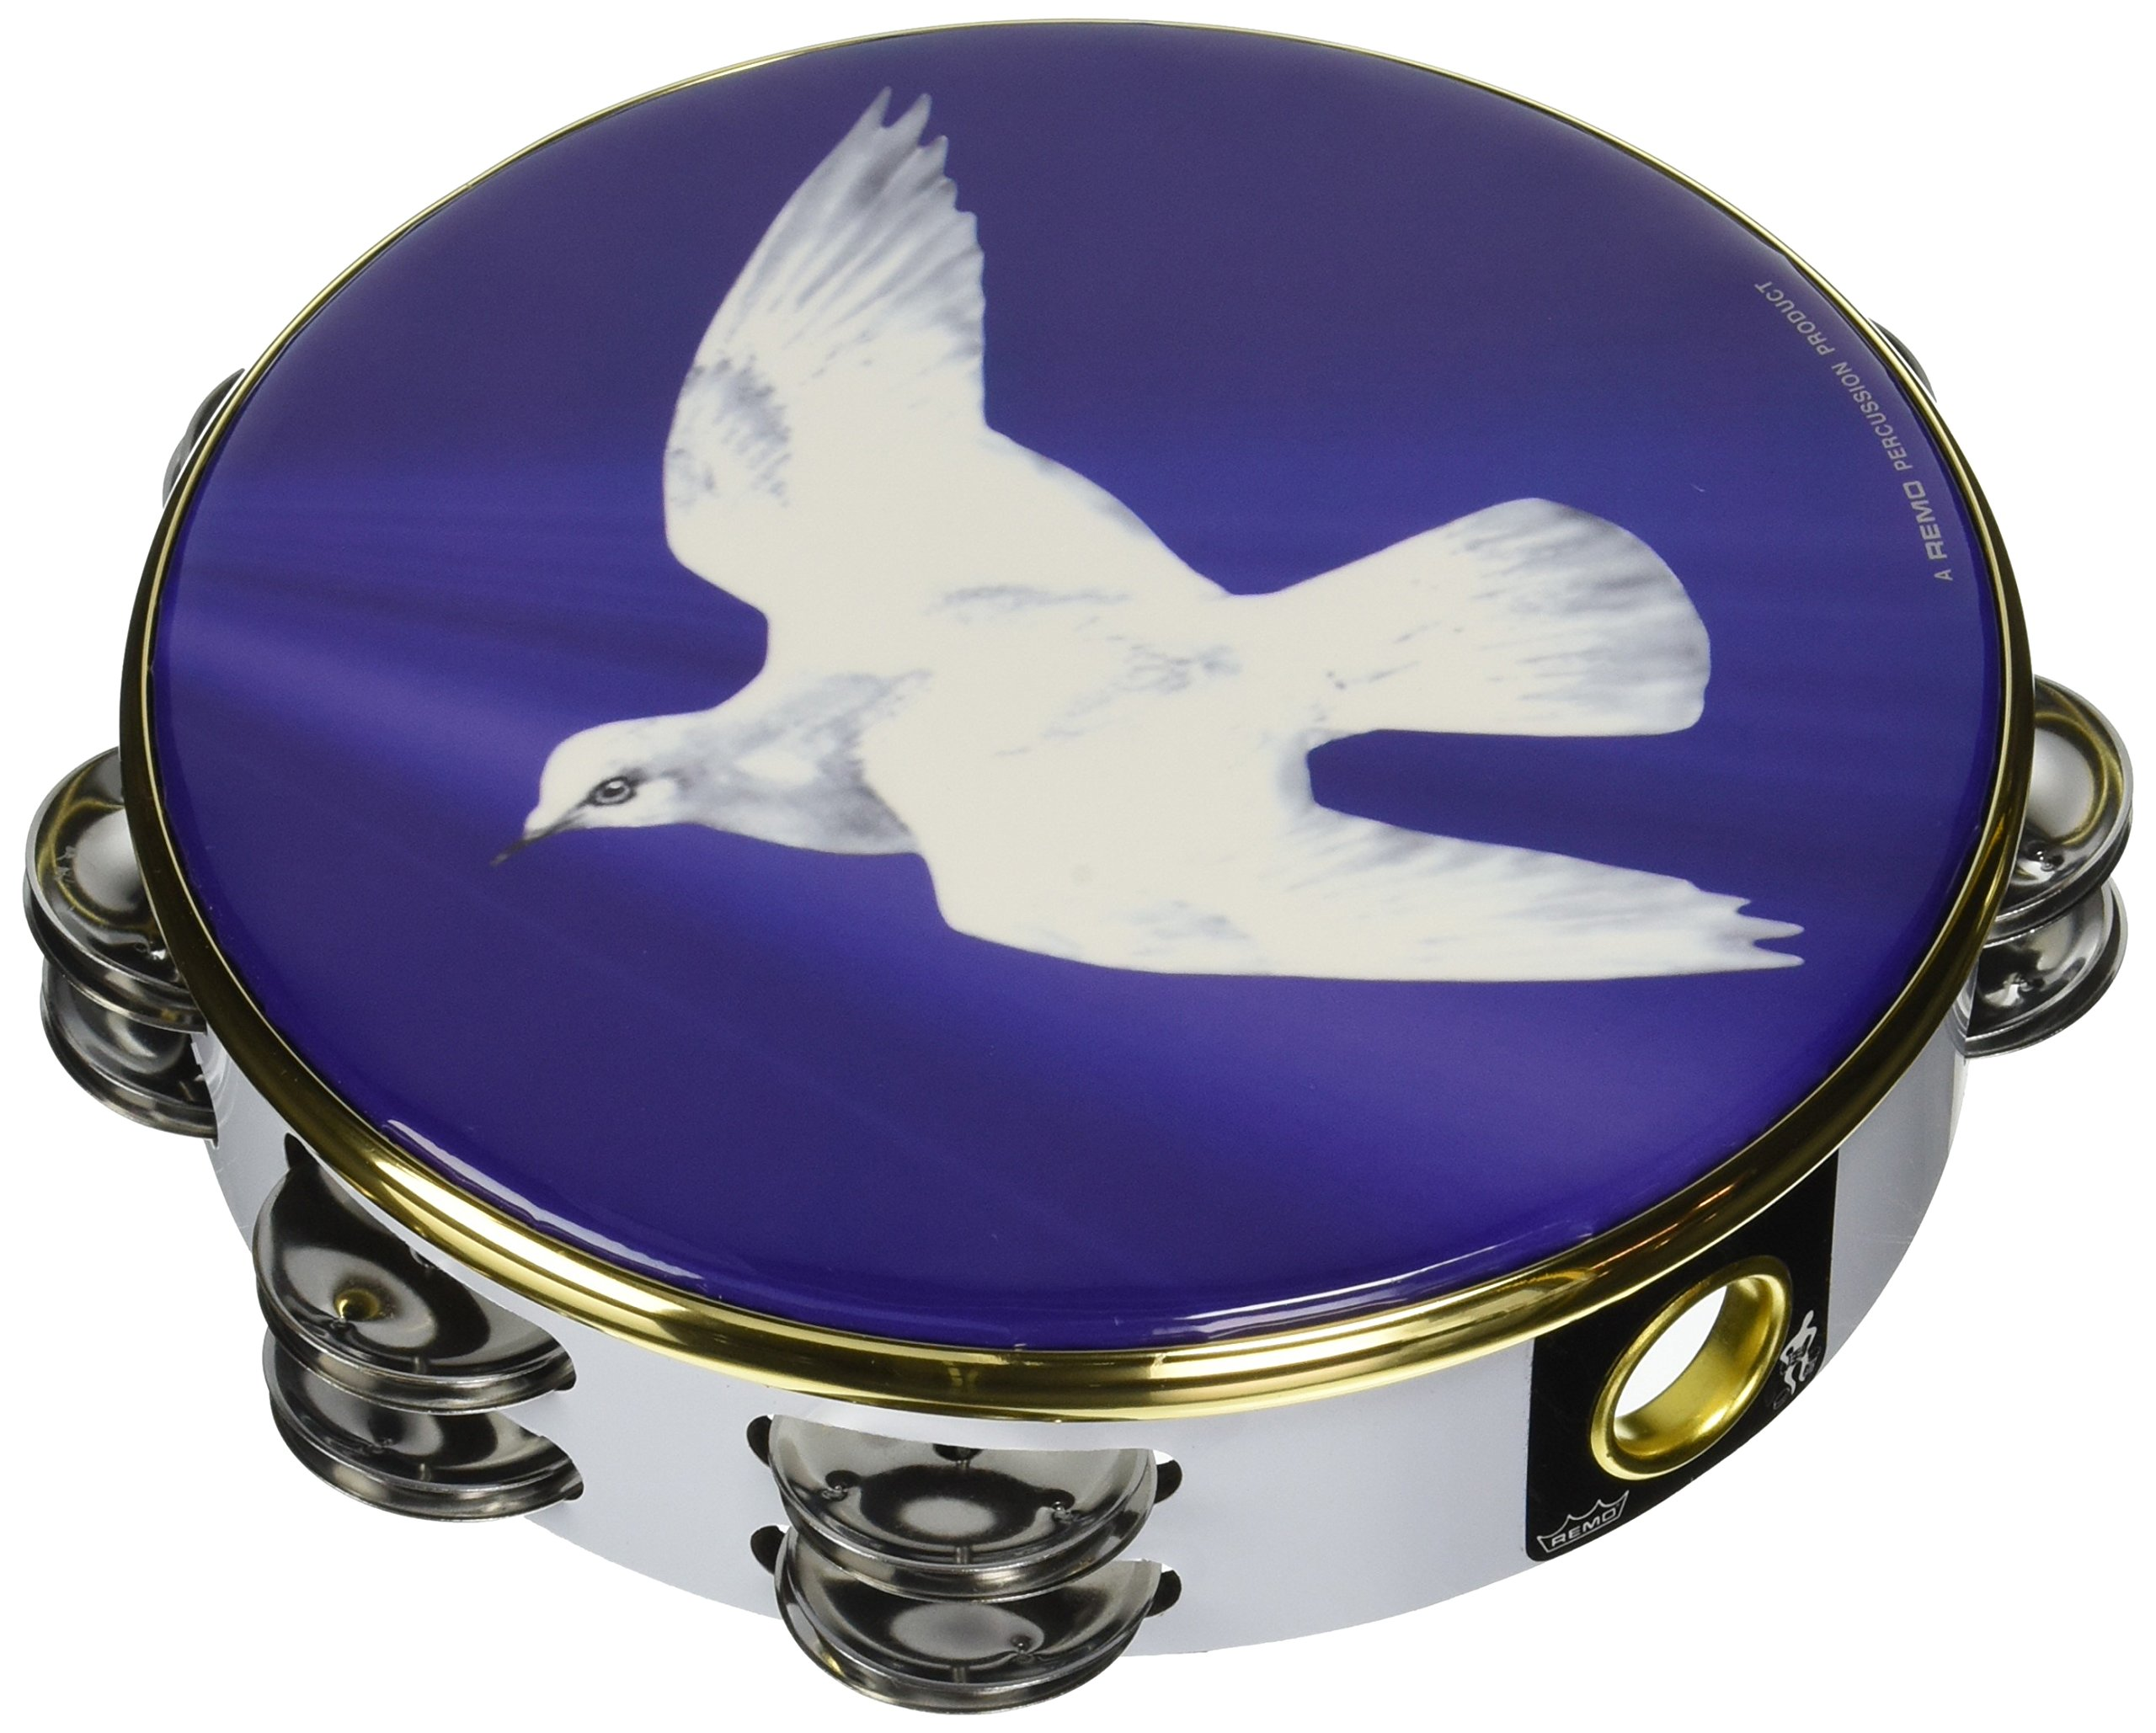 Remo Tambourine, 8'' Diameter, 8 Pairs Jingles x 2 Rows, 'Religious Dove' Graphic